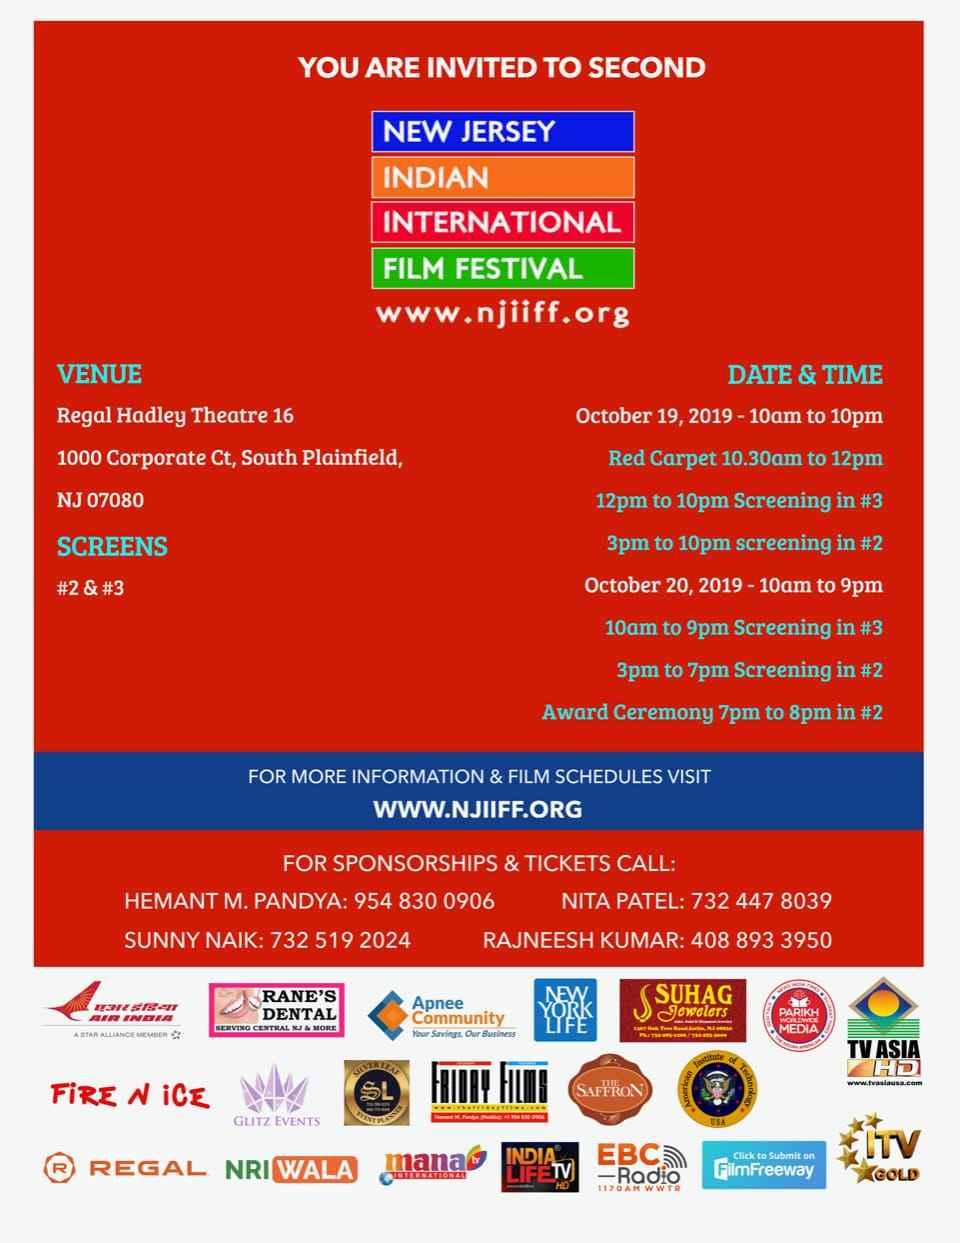 NEW JERSEY INDIAN INTERNATIONAL FILM FESTIVAL